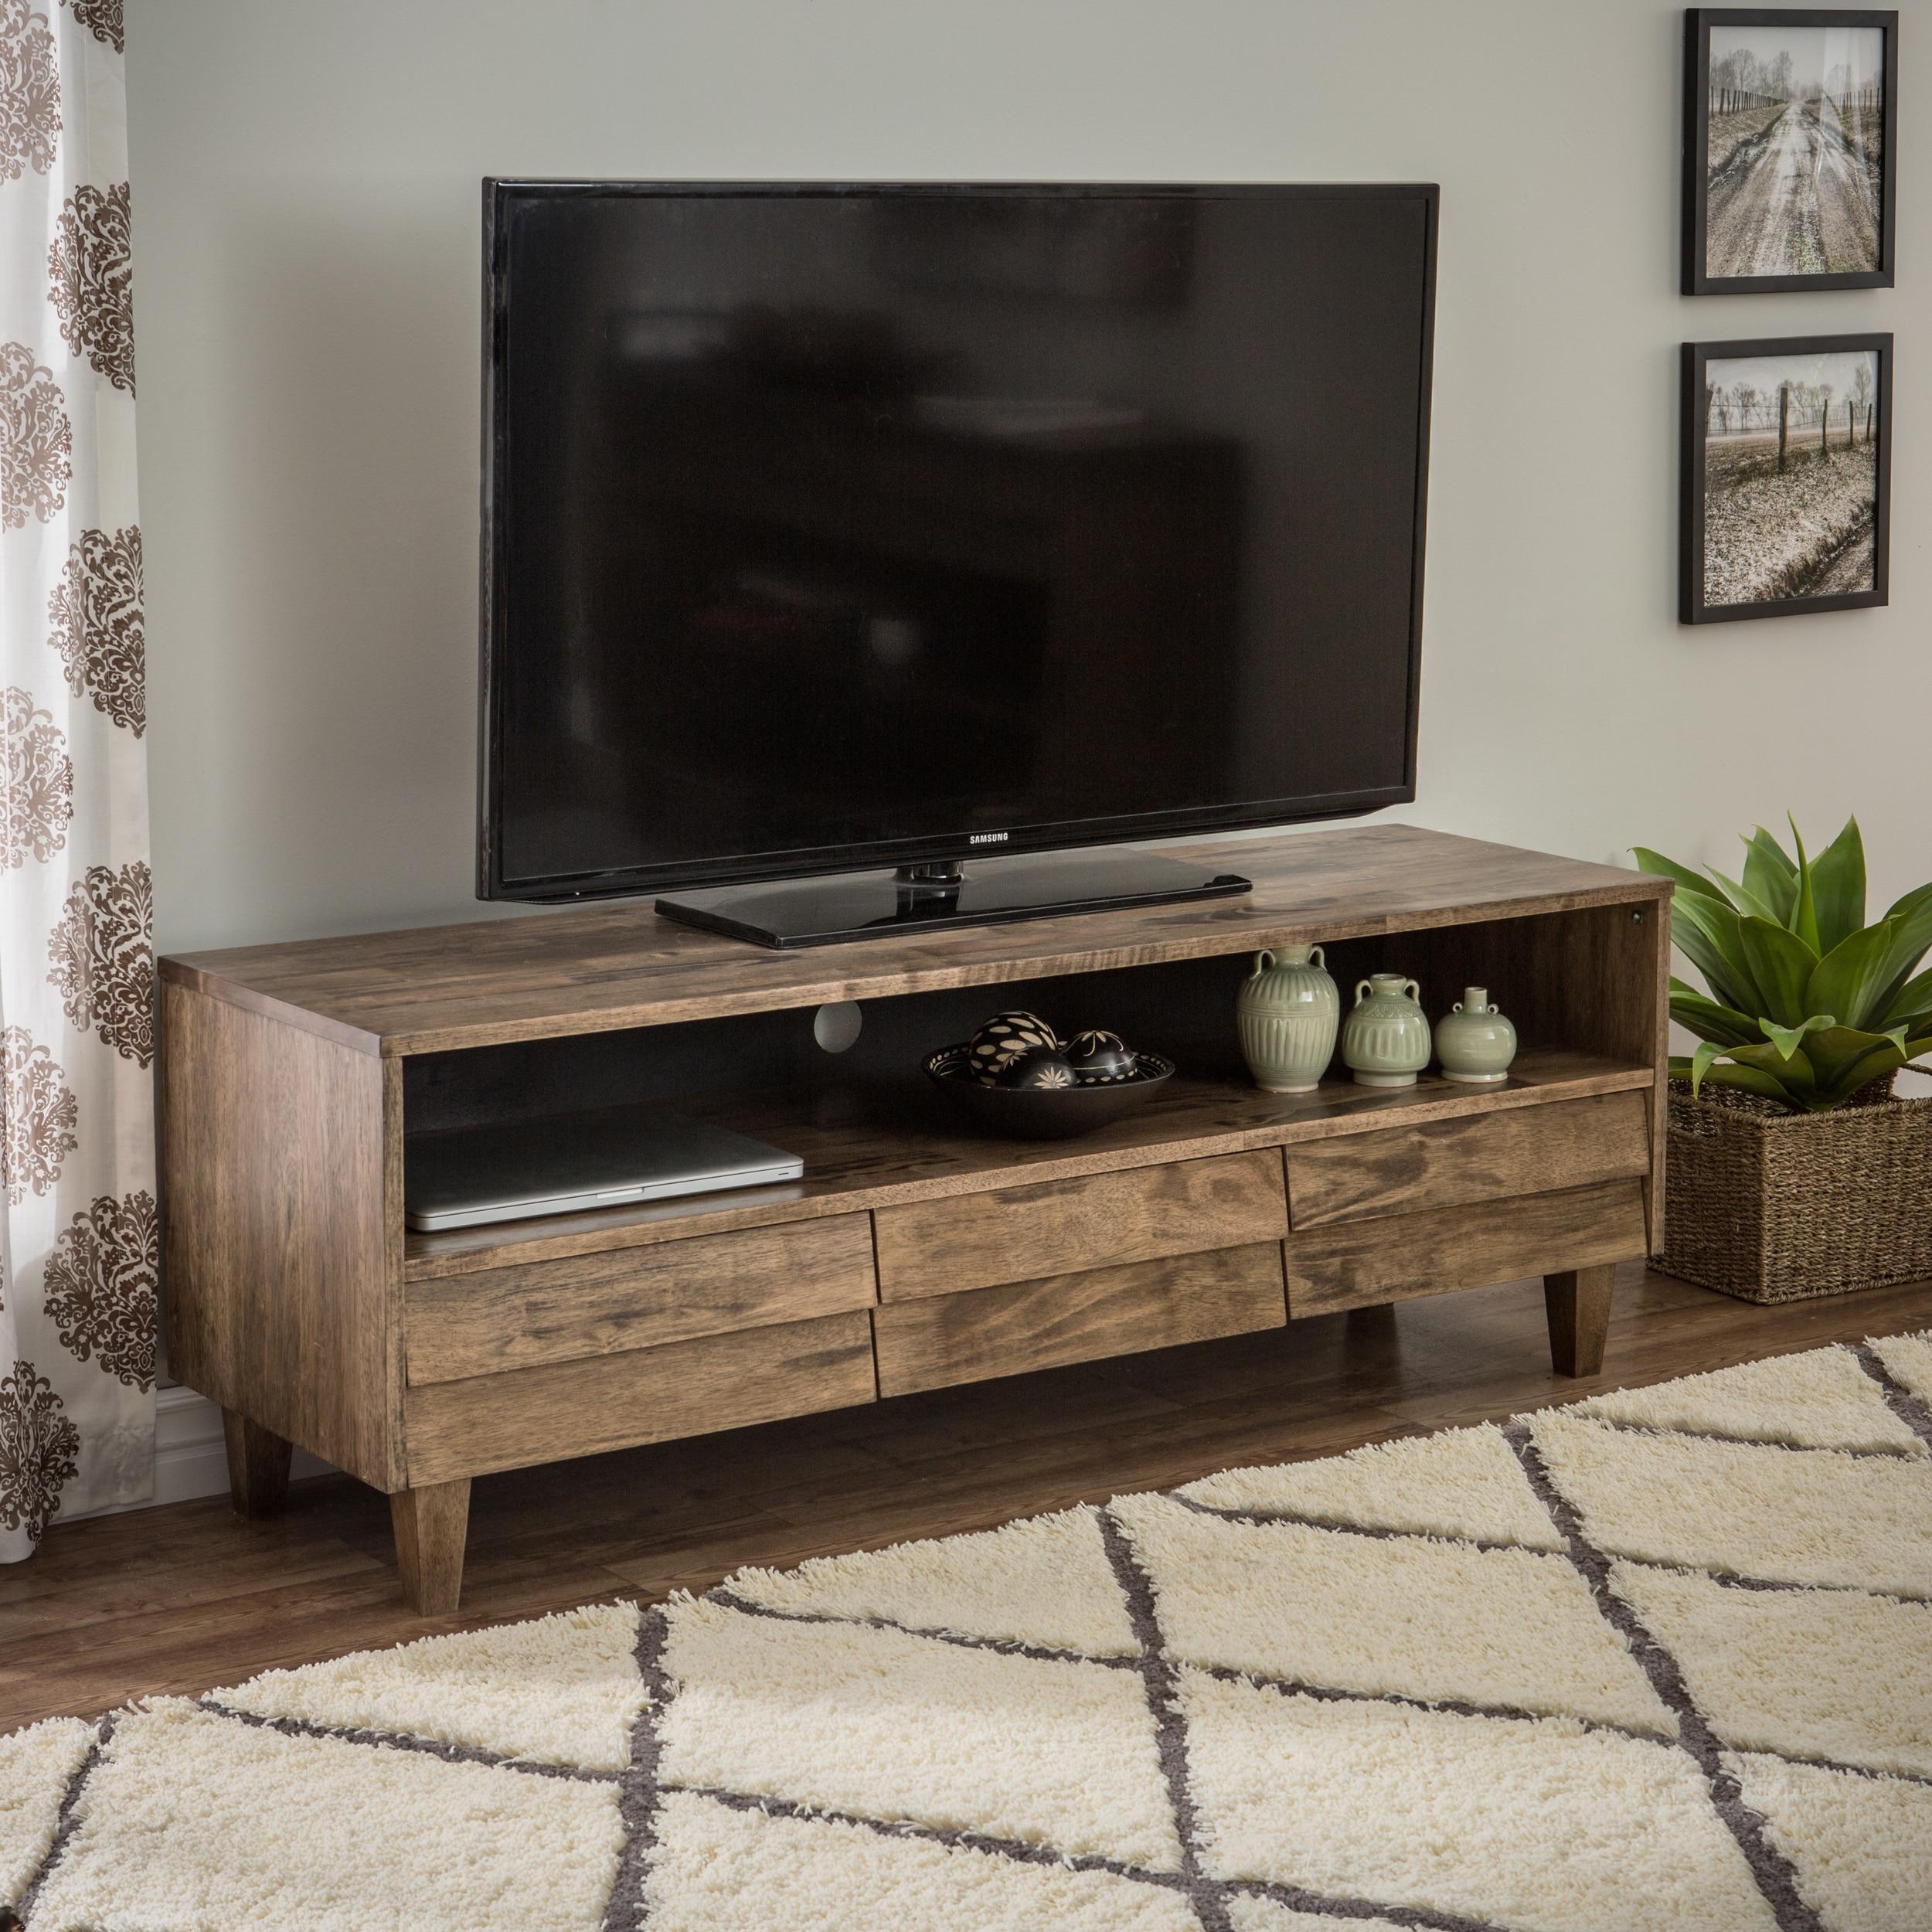 is stand image center tv room grey modern mid entertainment living style dark century loading itm for full